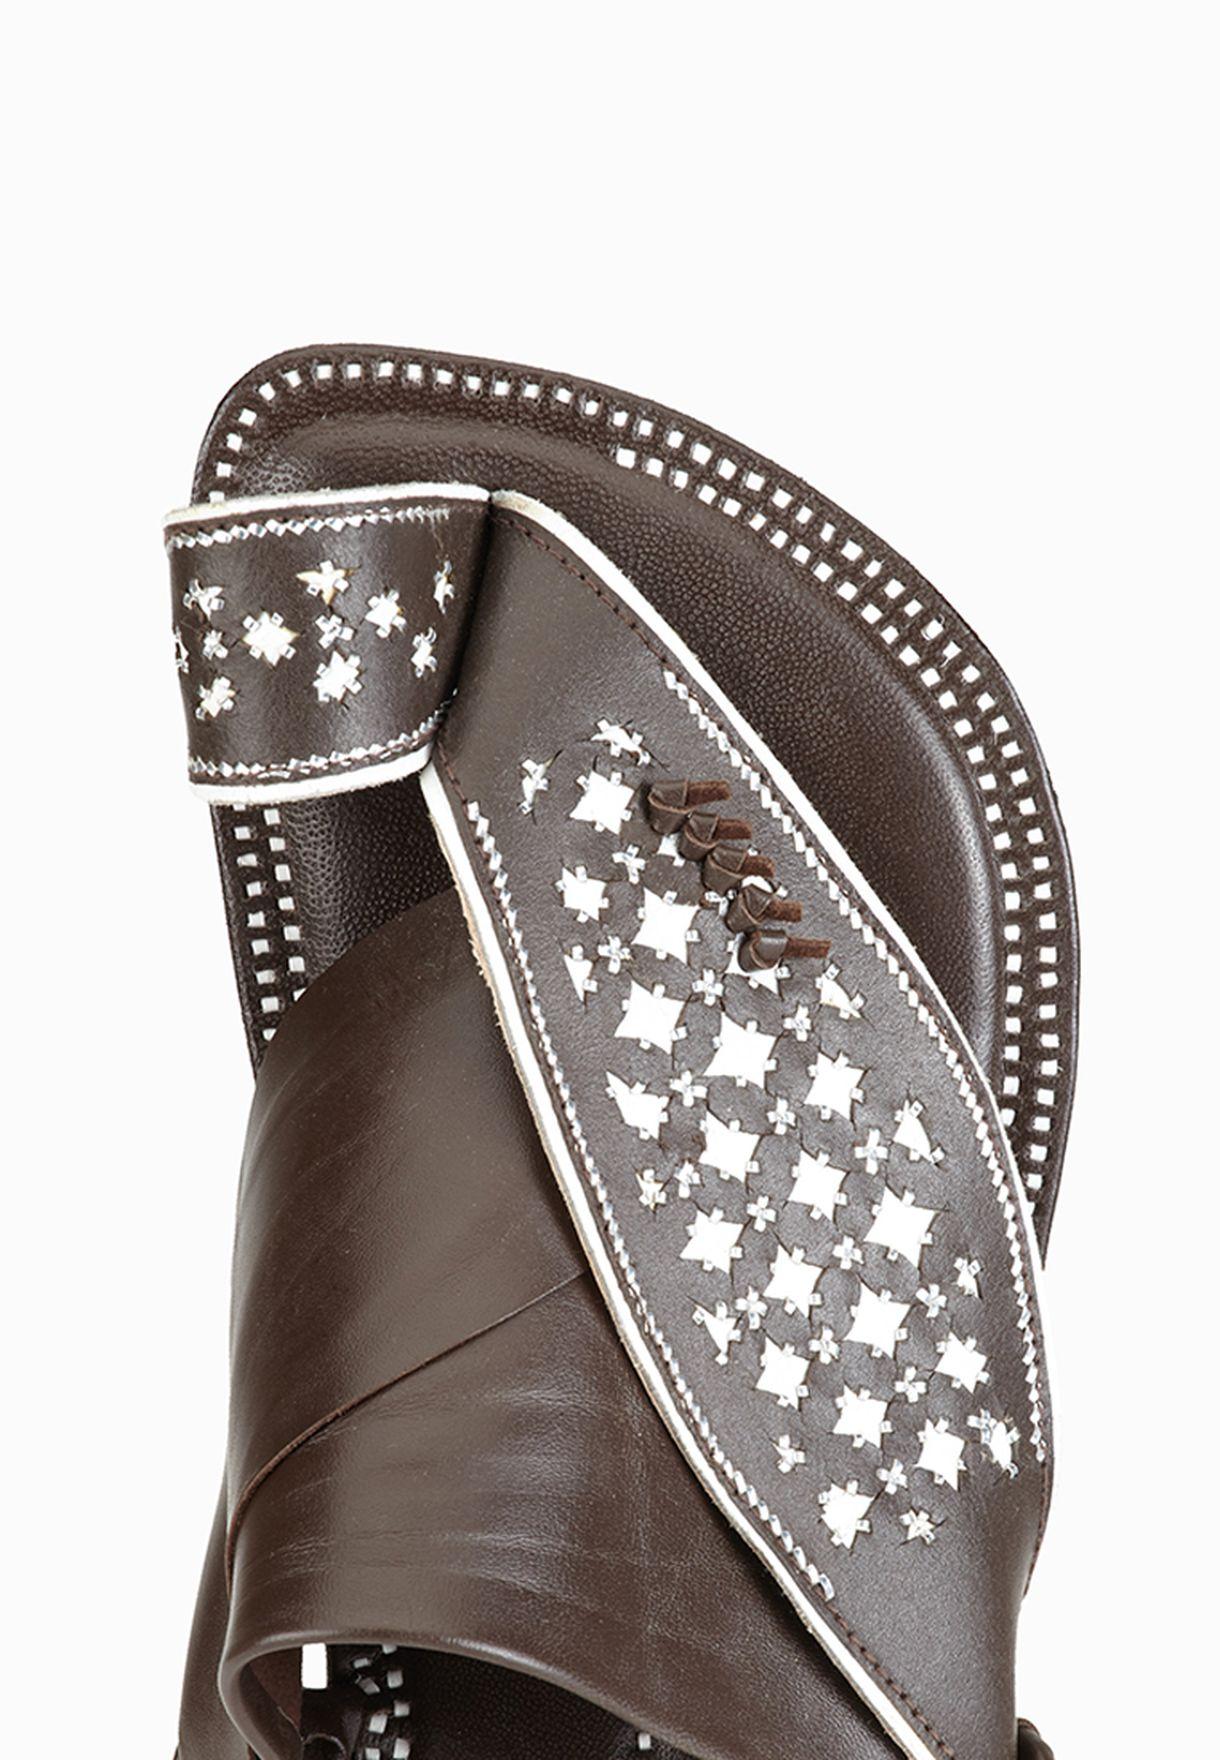 Damas-Bistre Sandals